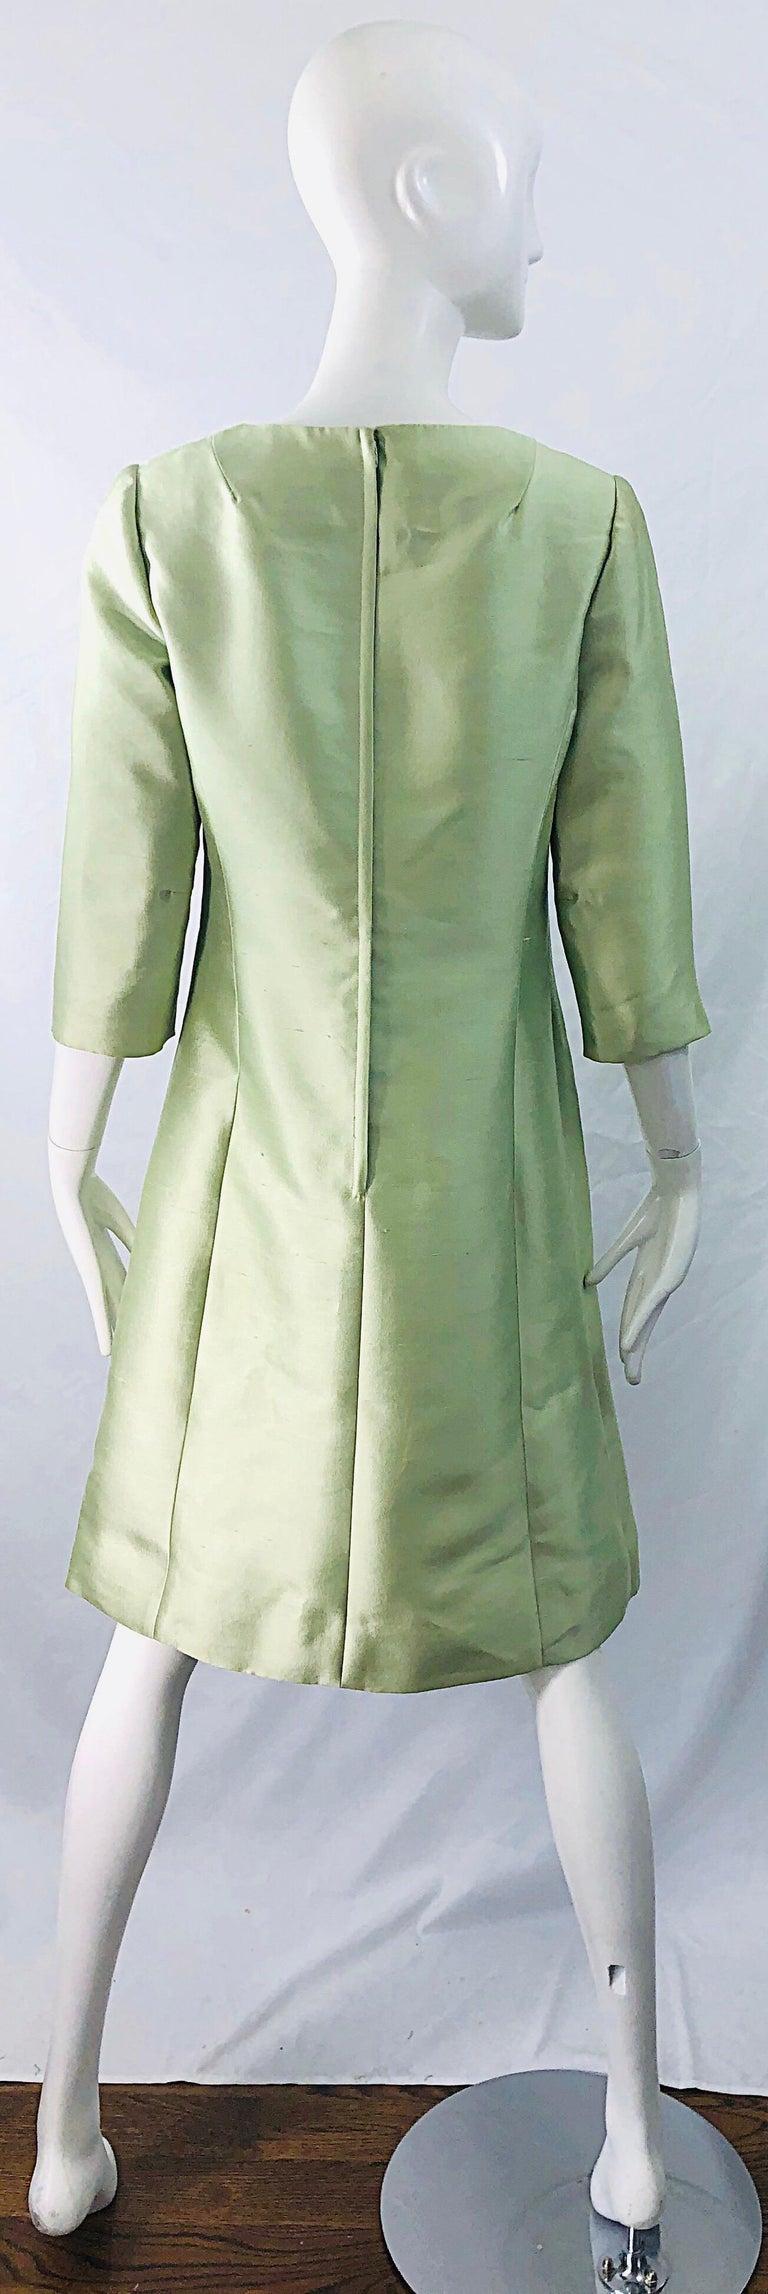 Chic 1960s Mint Green Silk Shantung Rhinestone Vintage 60s A Line Dress For Sale 6